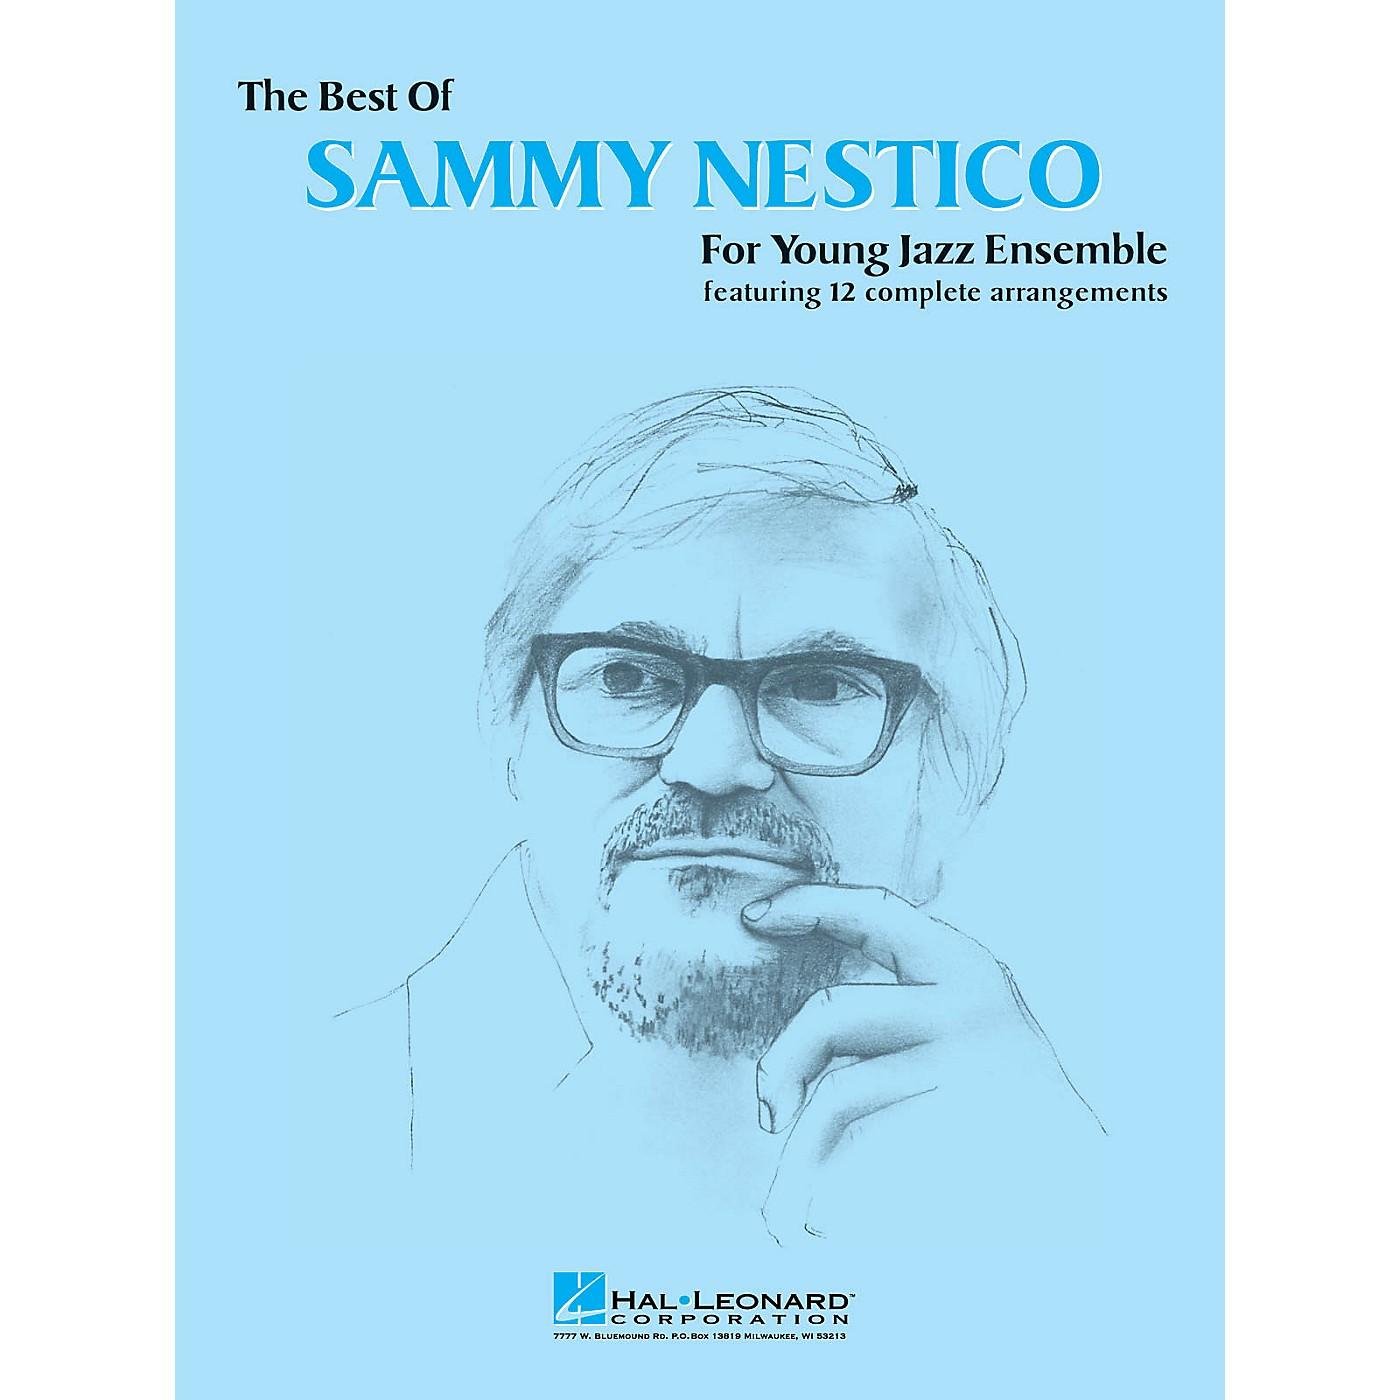 Hal Leonard The Best of Sammy Nestico - Alto Sax 1 Jazz Band Level 2-3 Arranged by Sammy Nestico thumbnail